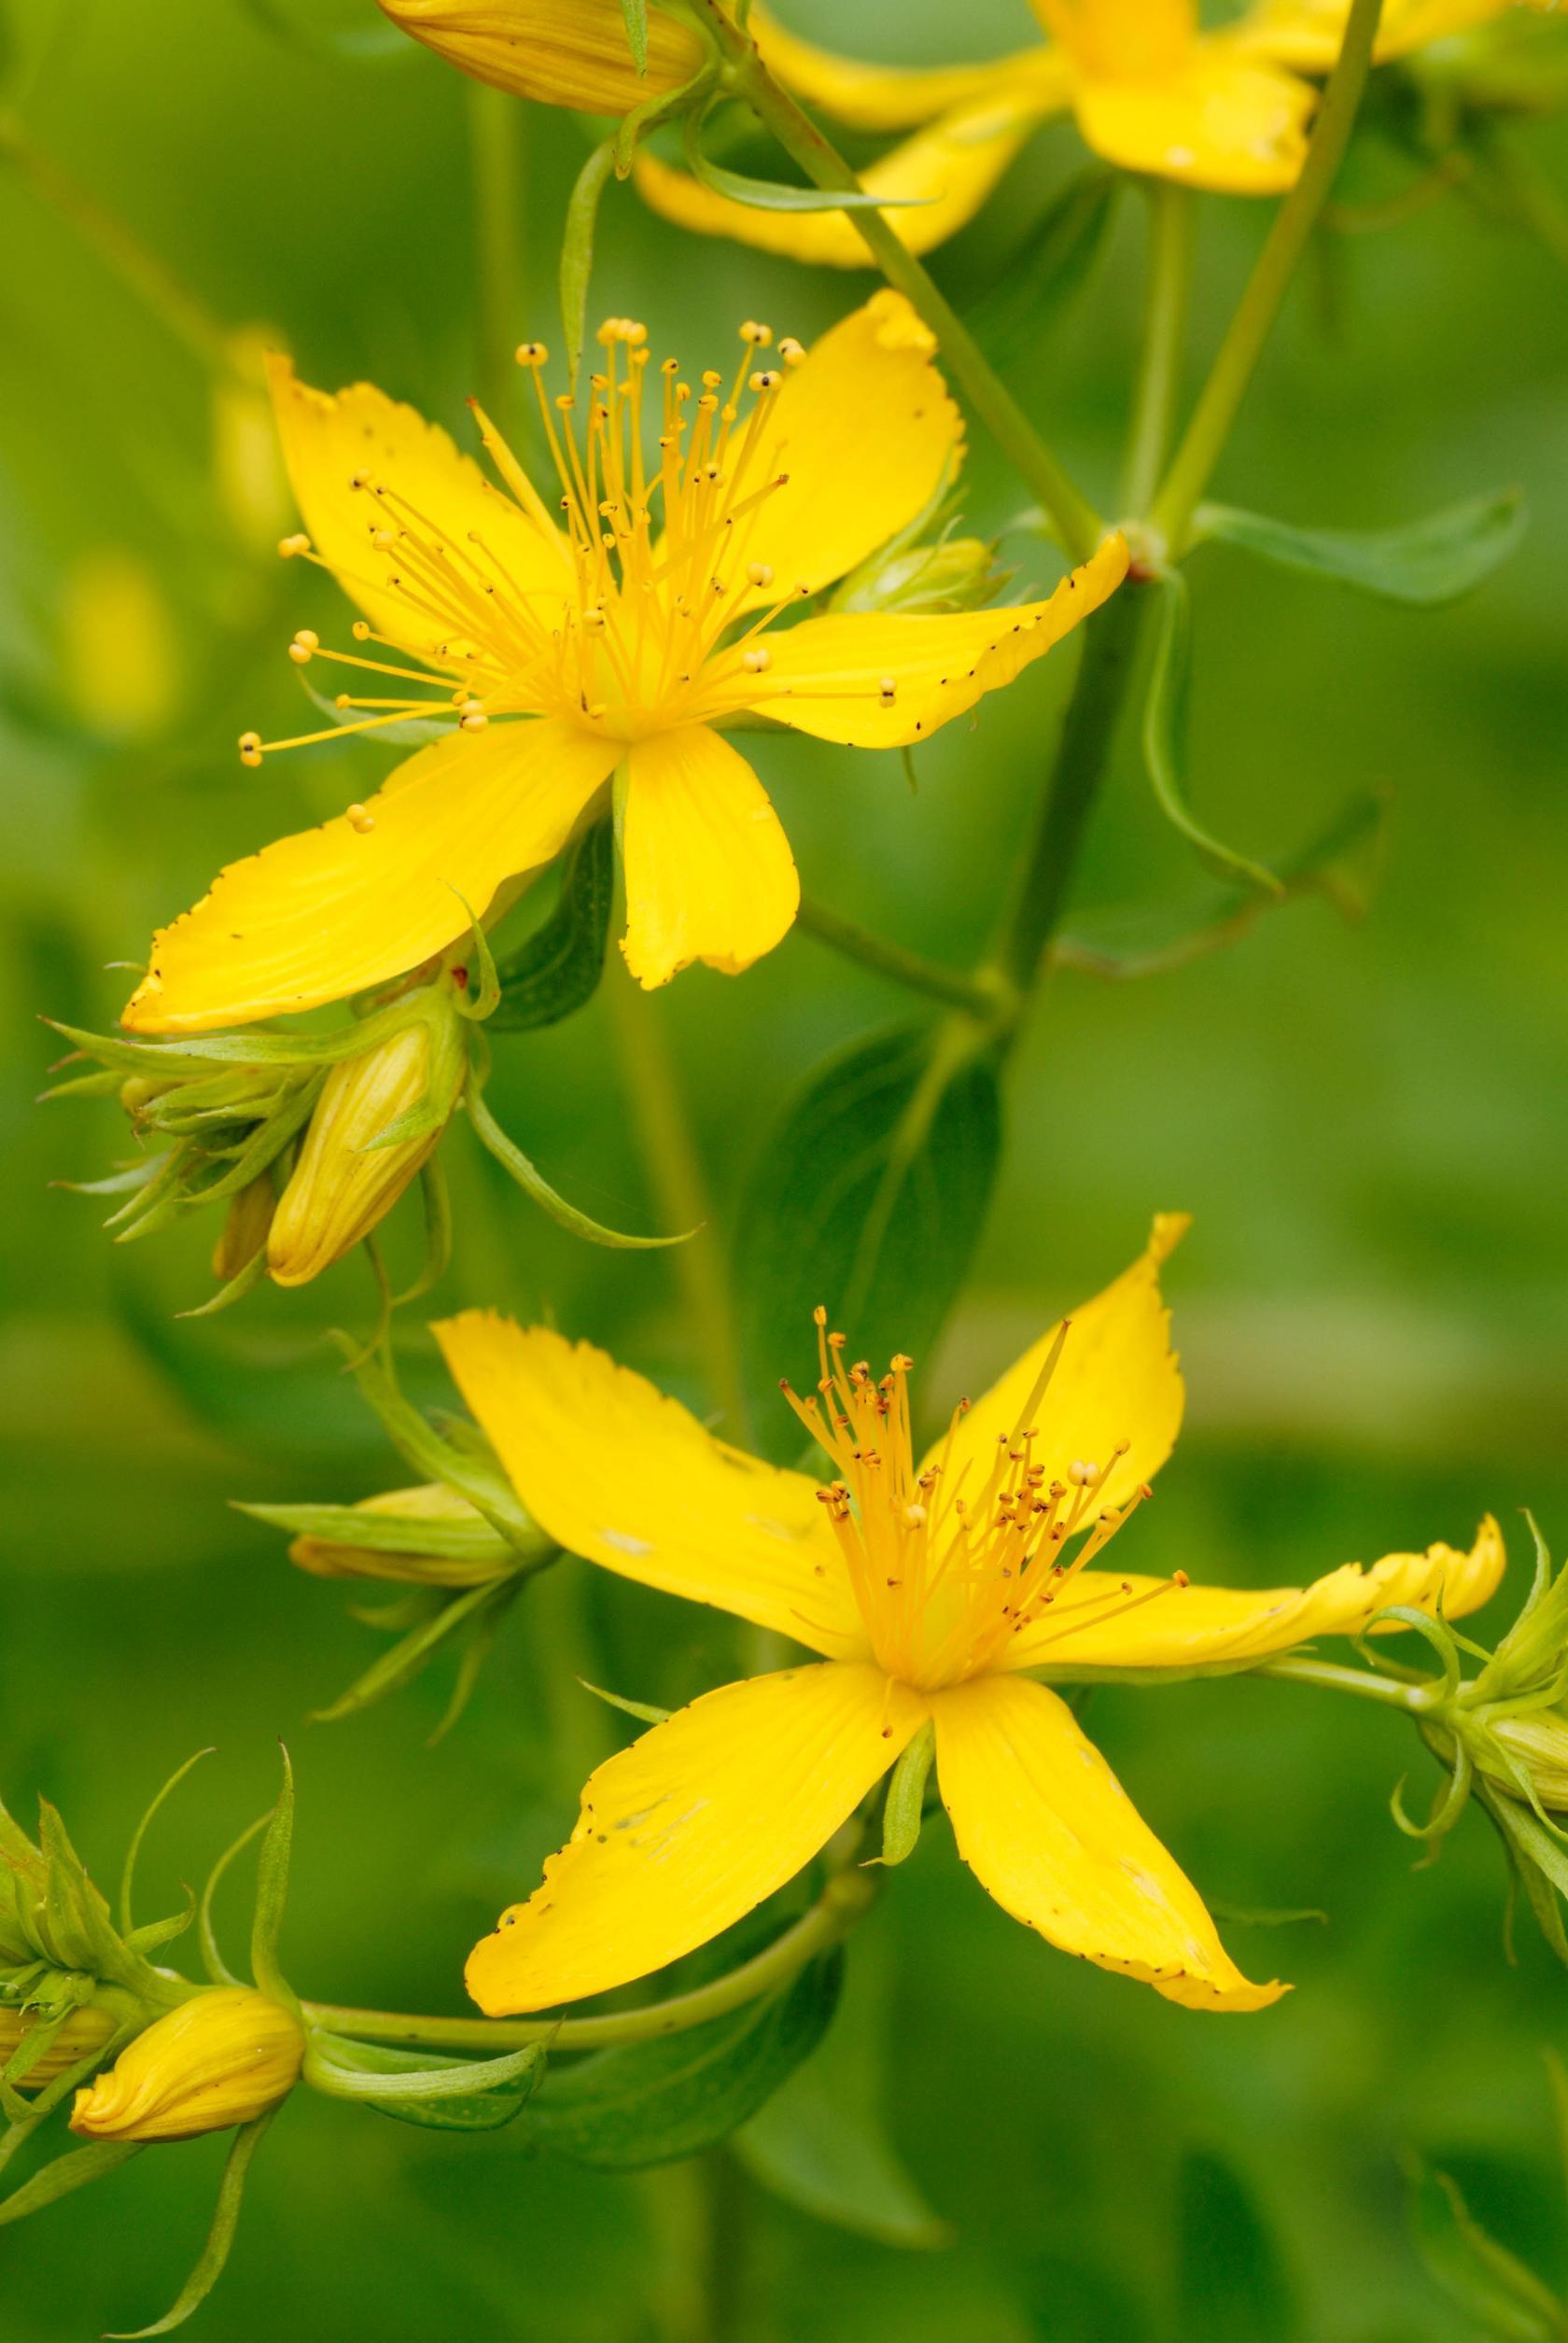 Yellow Petal Flowers Images - Flower Decoration Ideas